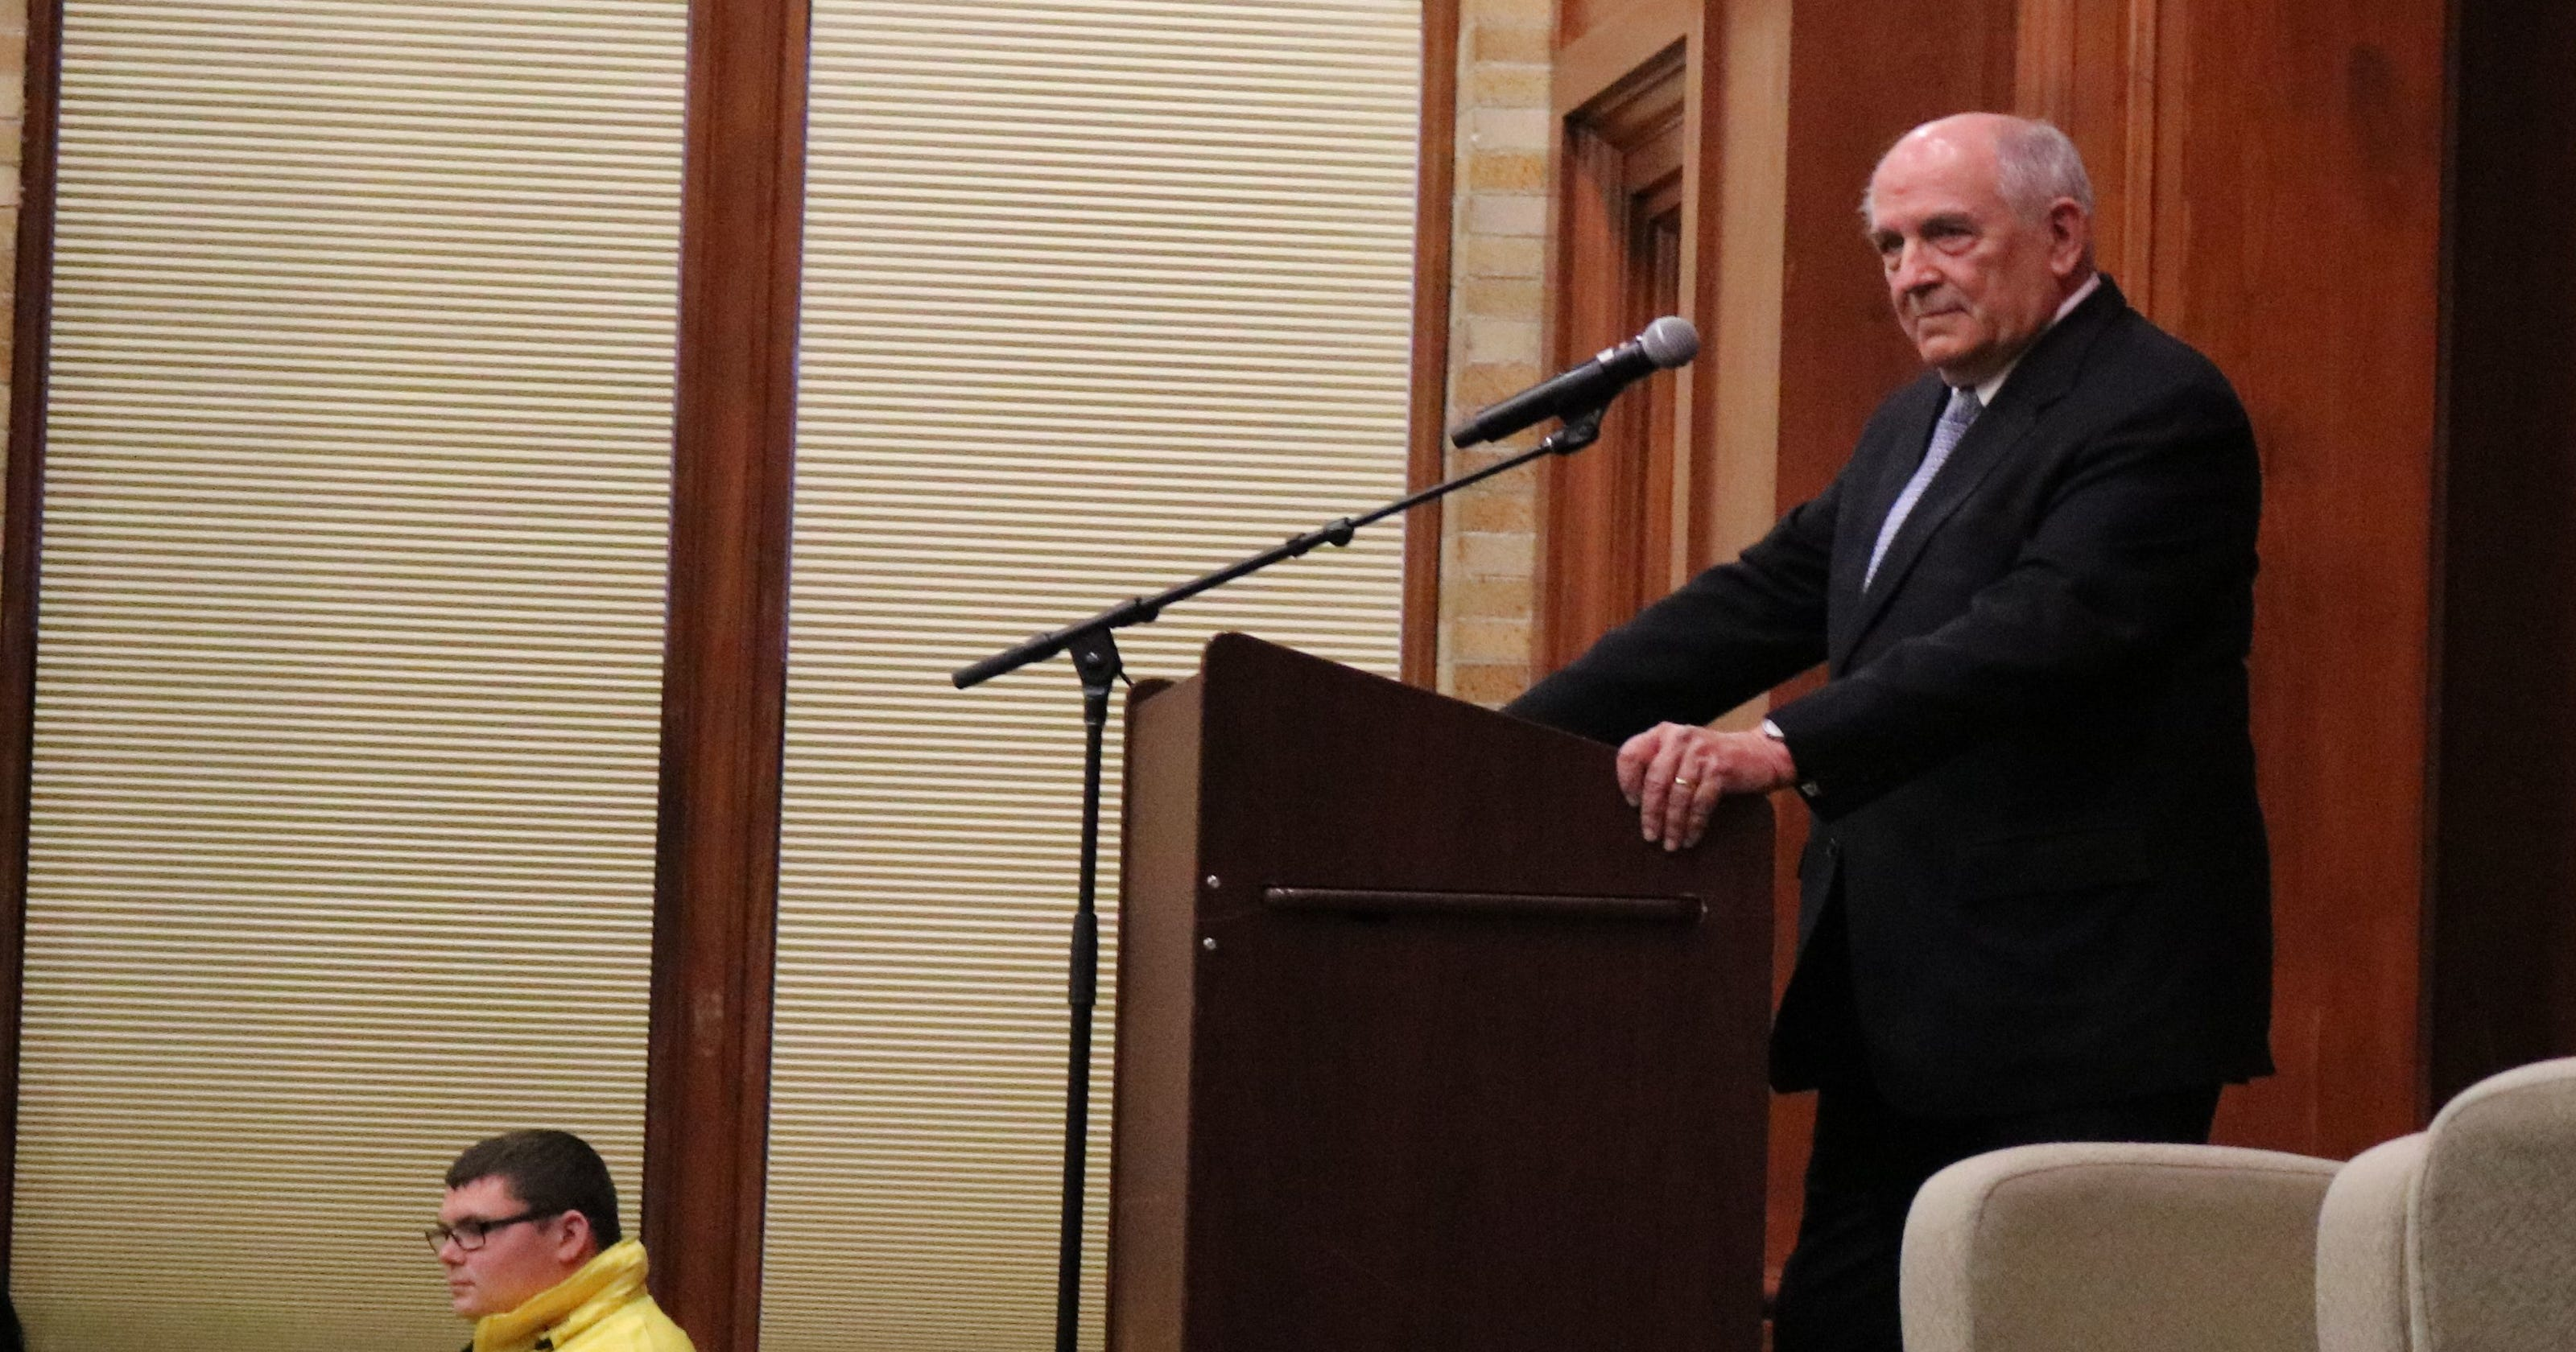 Madison preparing for libertarian speaker Charles Murray after